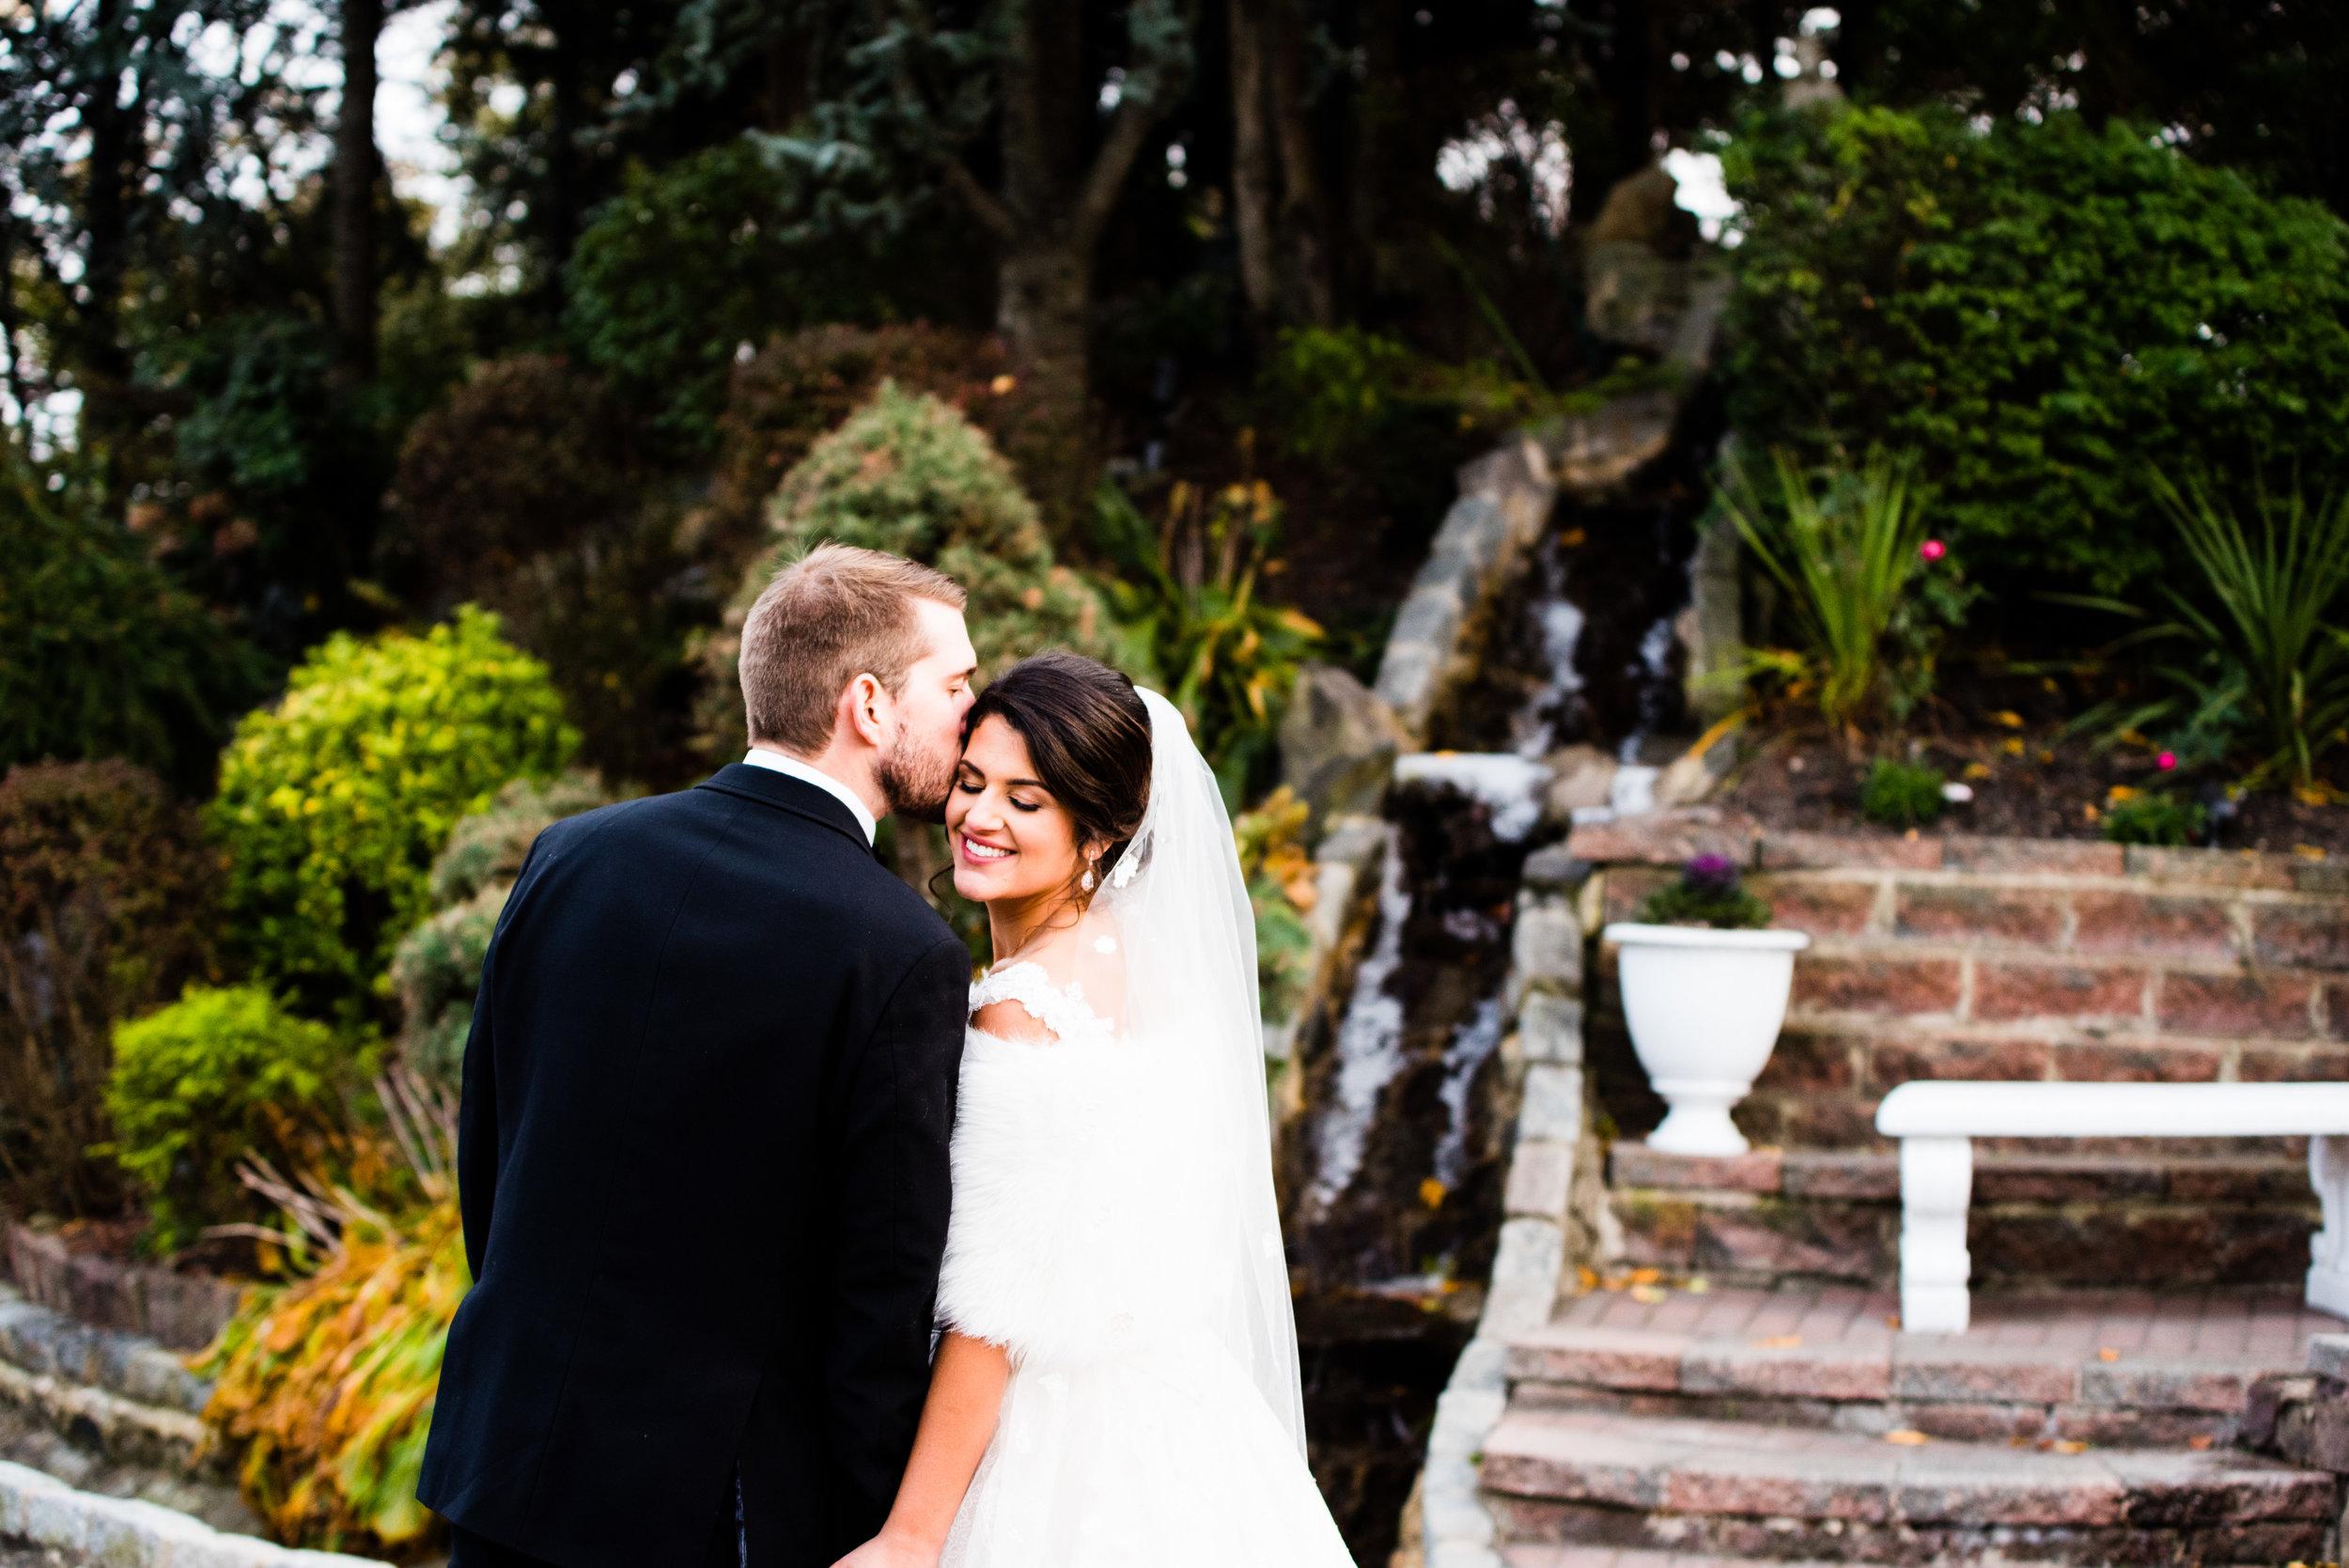 Luciens Manor Wedding Photos - 067.jpg